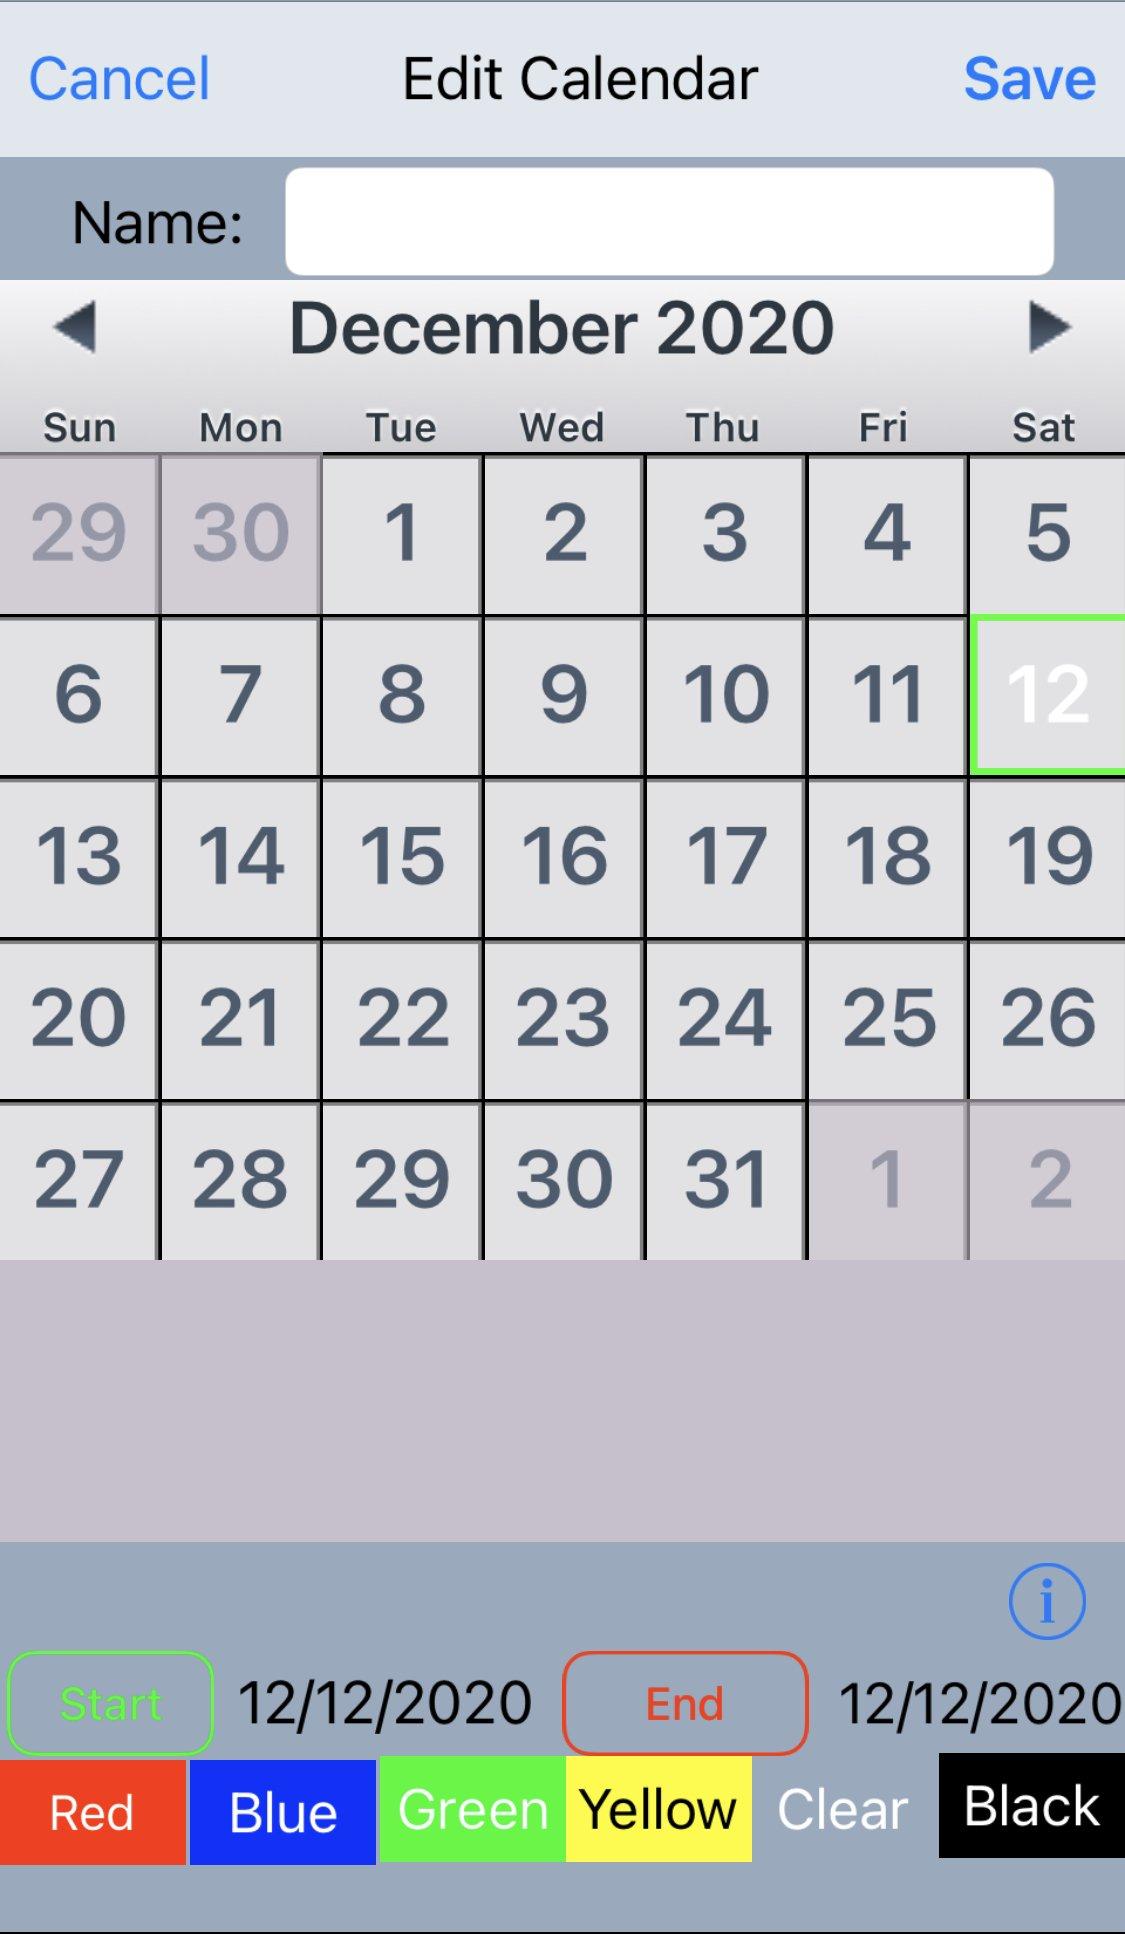 Ems/Fire Department Shift Calendar App - Custom Kelly